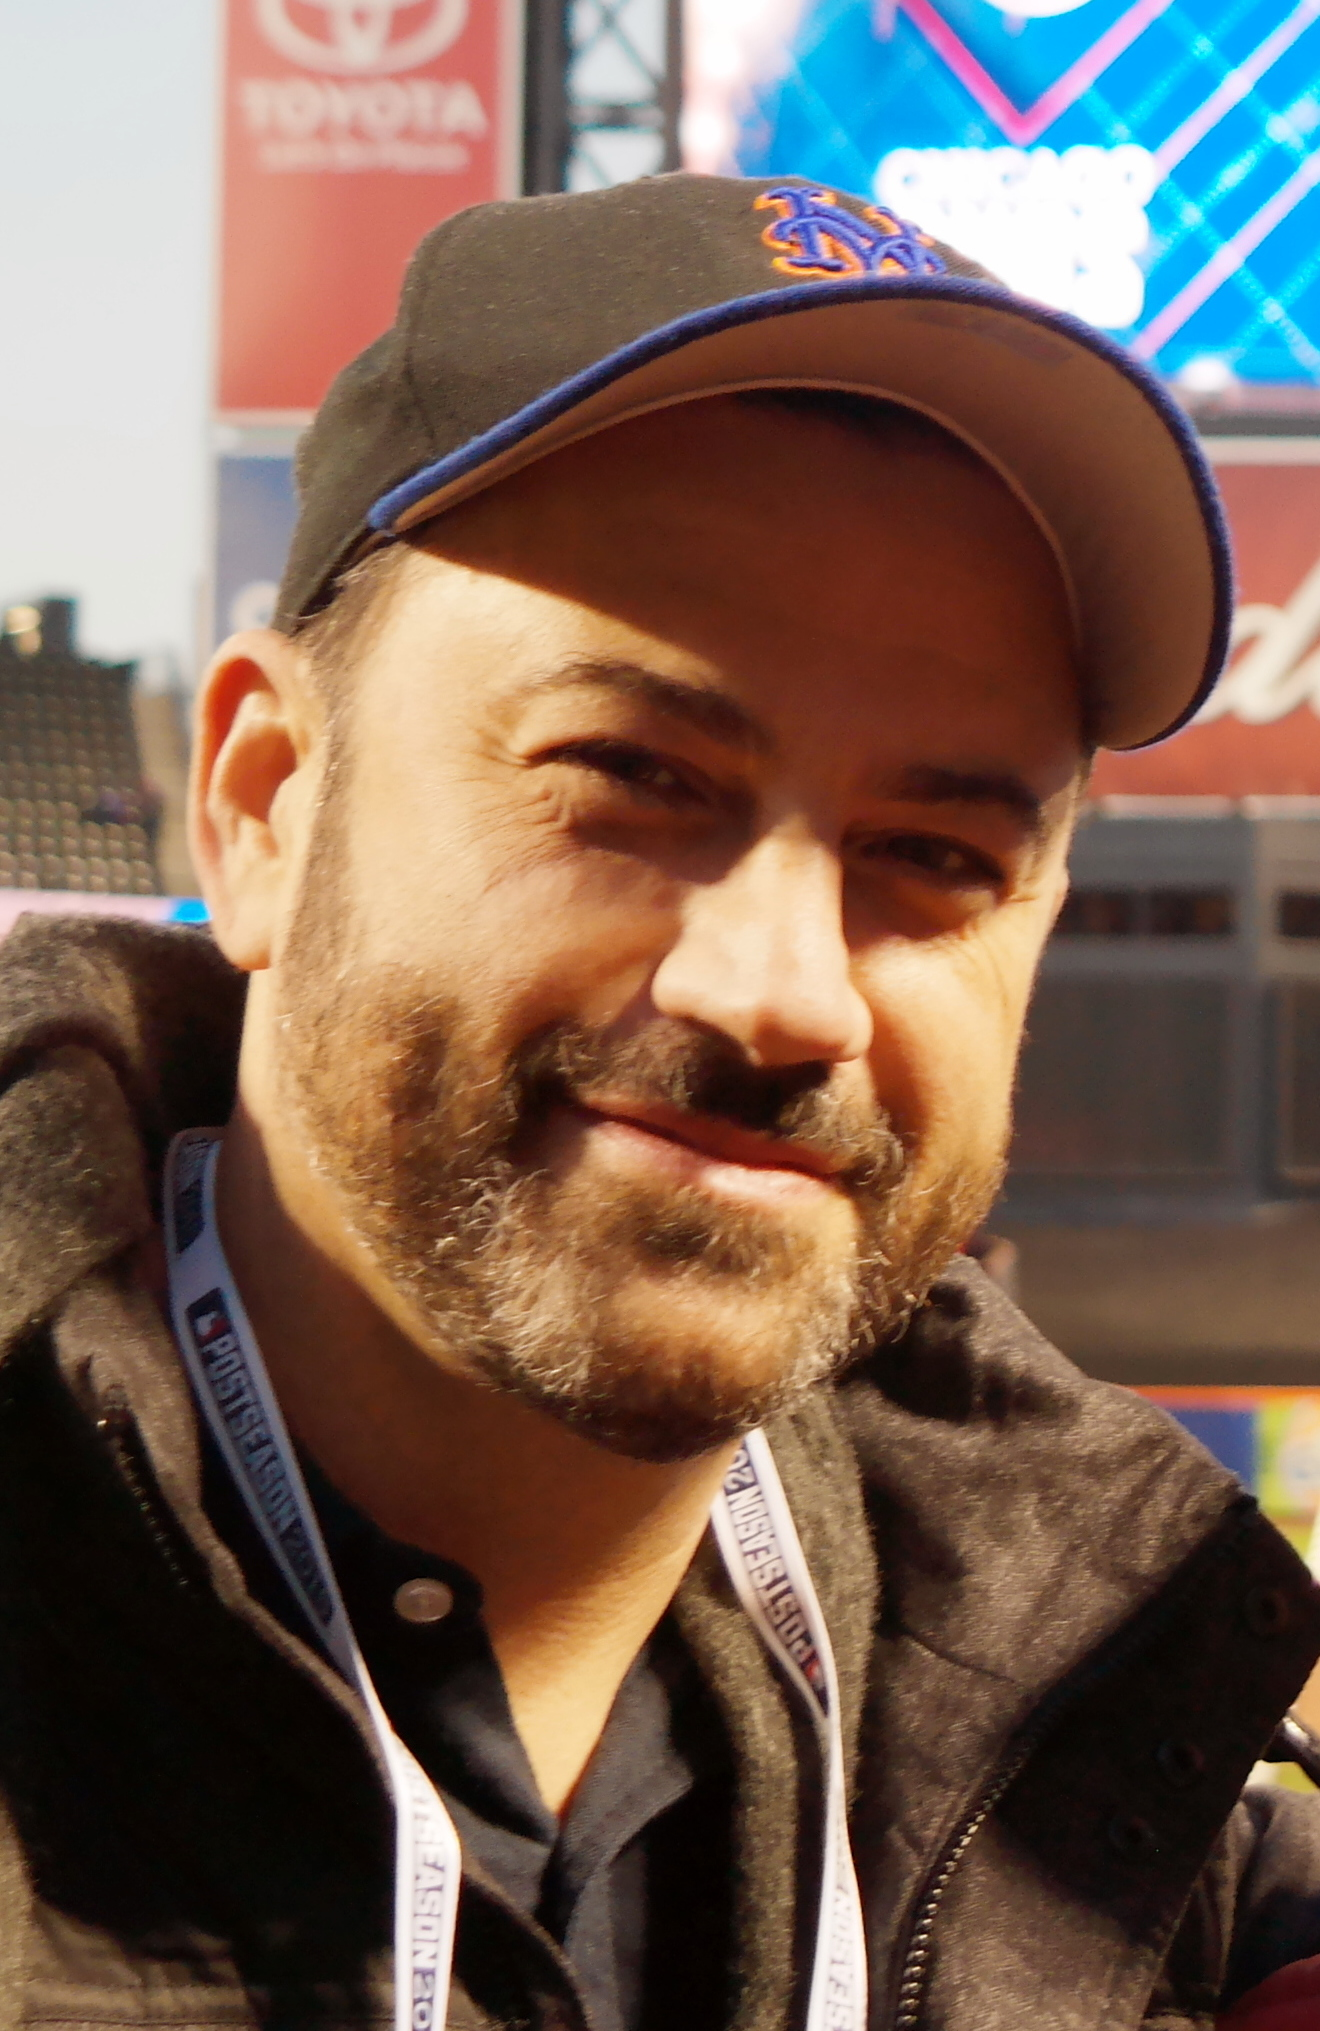 Jimmy Kimmel Wikipedia Jimmy kimmel & kevin nealon. wikipedia